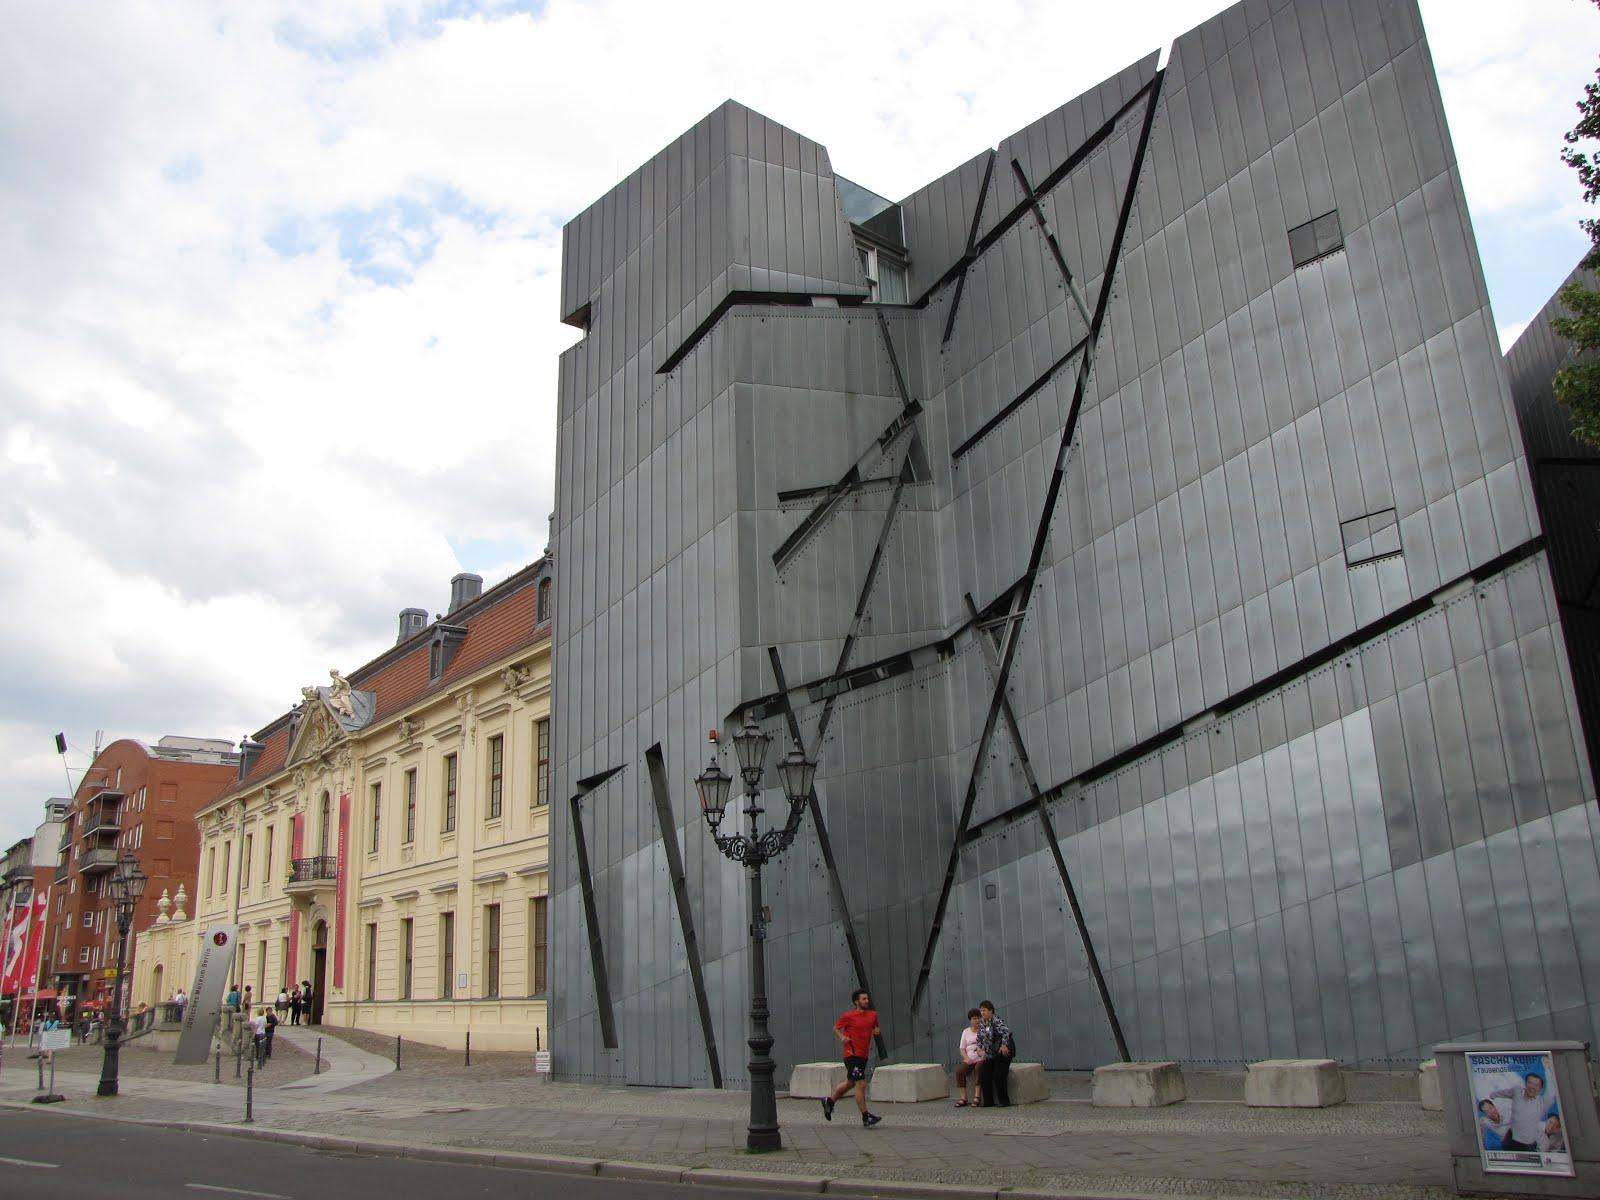 Salukitecture: Music and Architecture